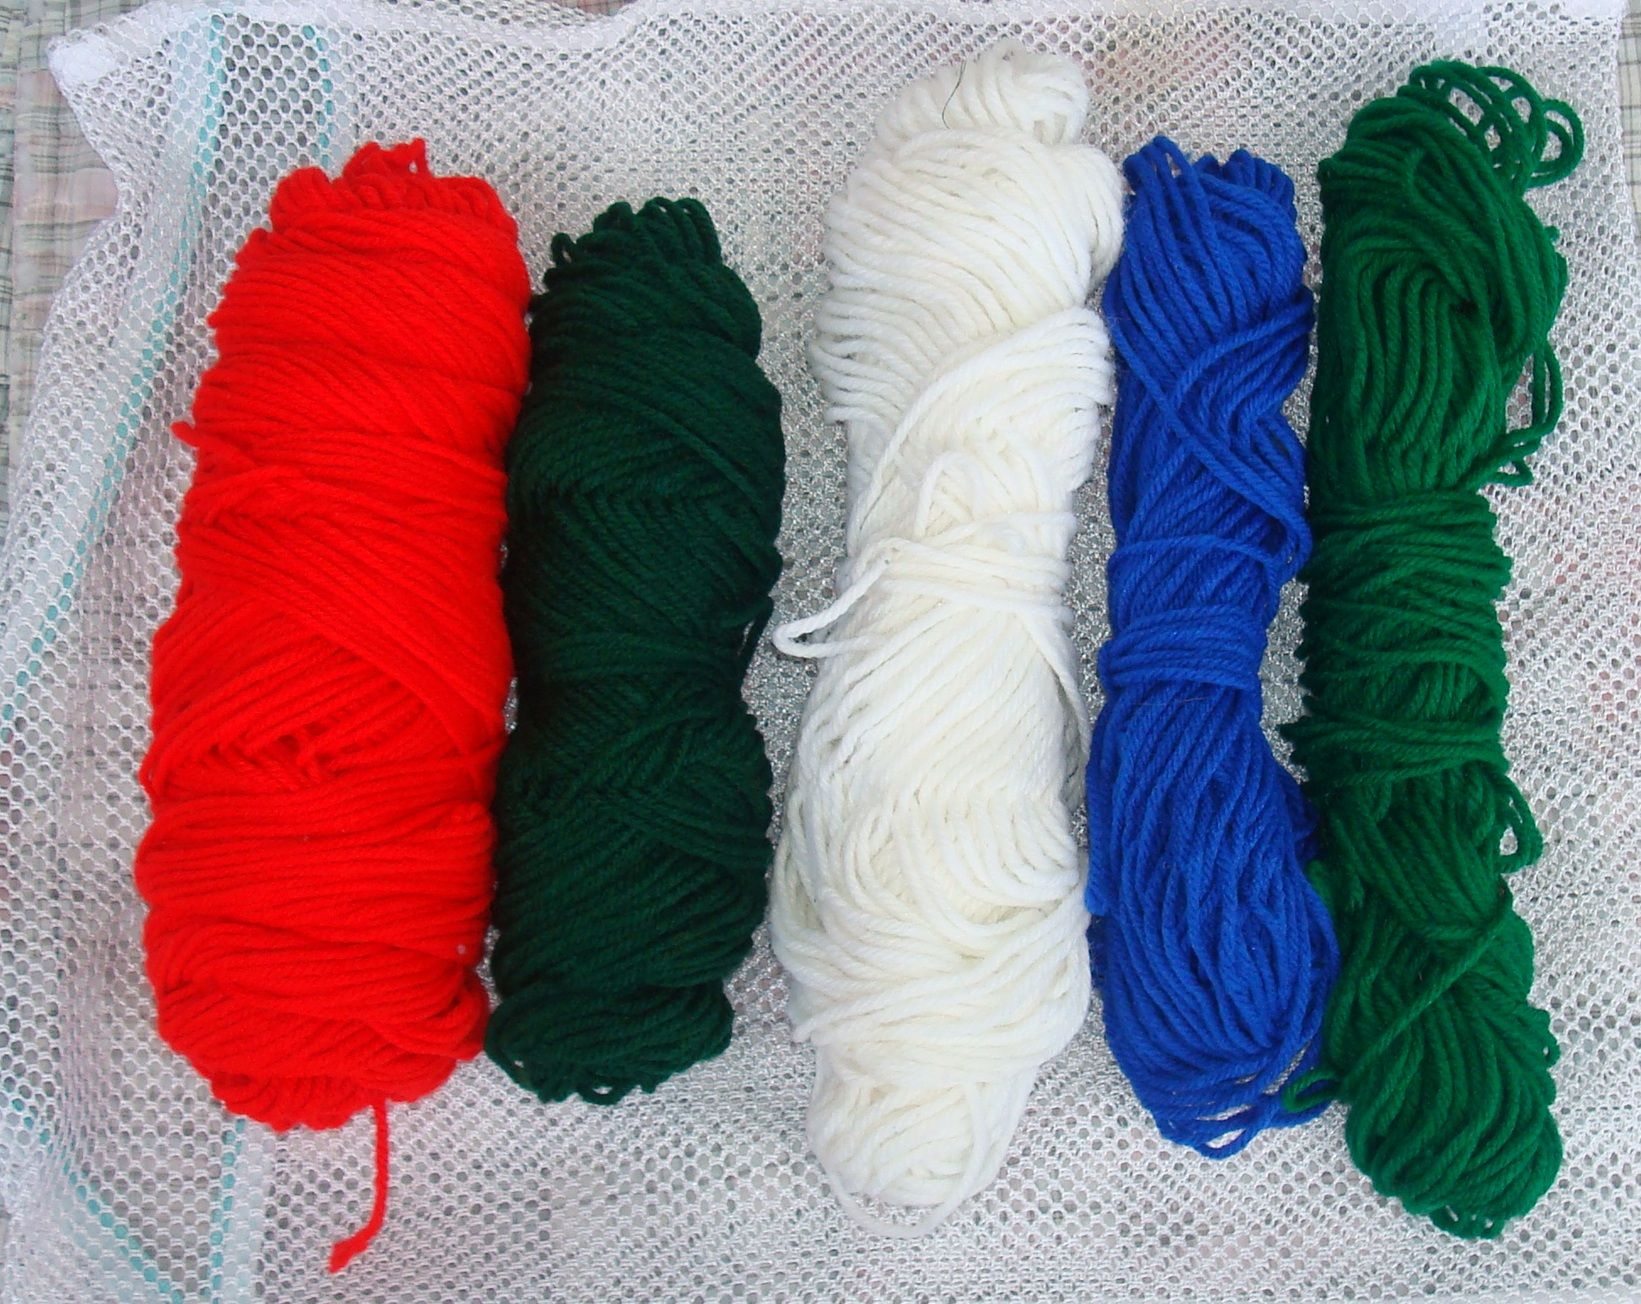 Softening Acrylic Yarn Experiment | Yarn Over, Pull Through